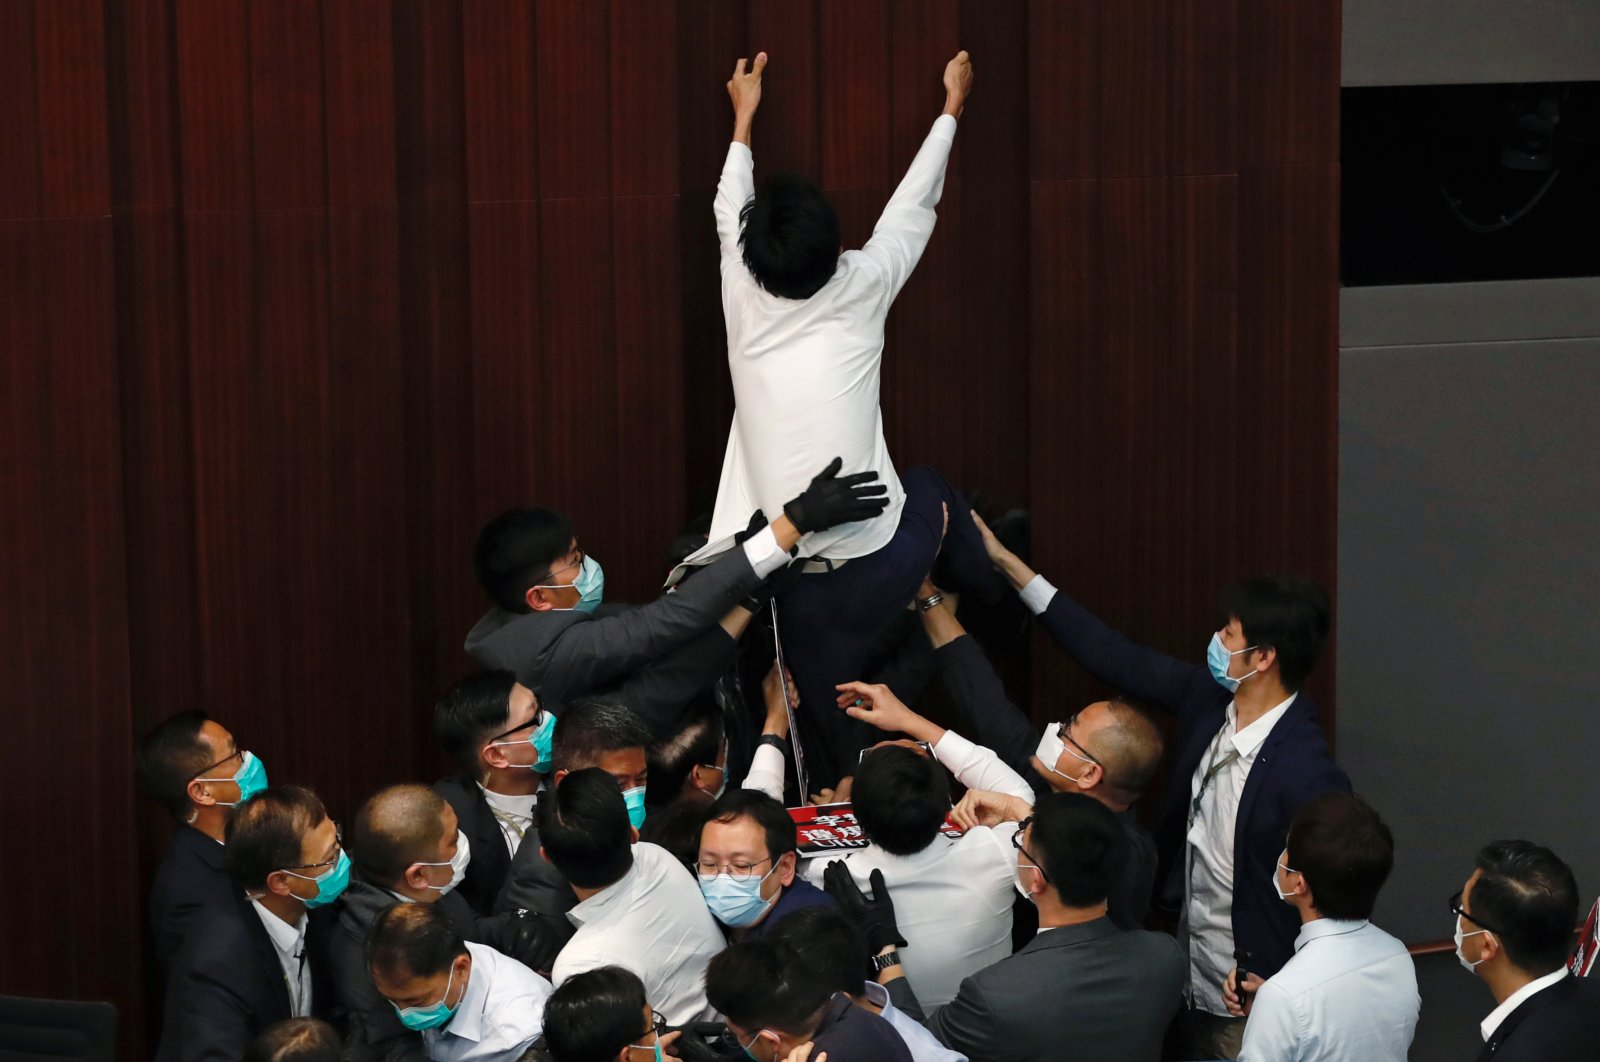 Pan-democratic legislator Eddie Chu Hoi-dick scuffles with security and pro-China legislators during Legislative Council's House Committee meeting, in Hong Kong, China, May 8, 2020. (Reuters Photo)